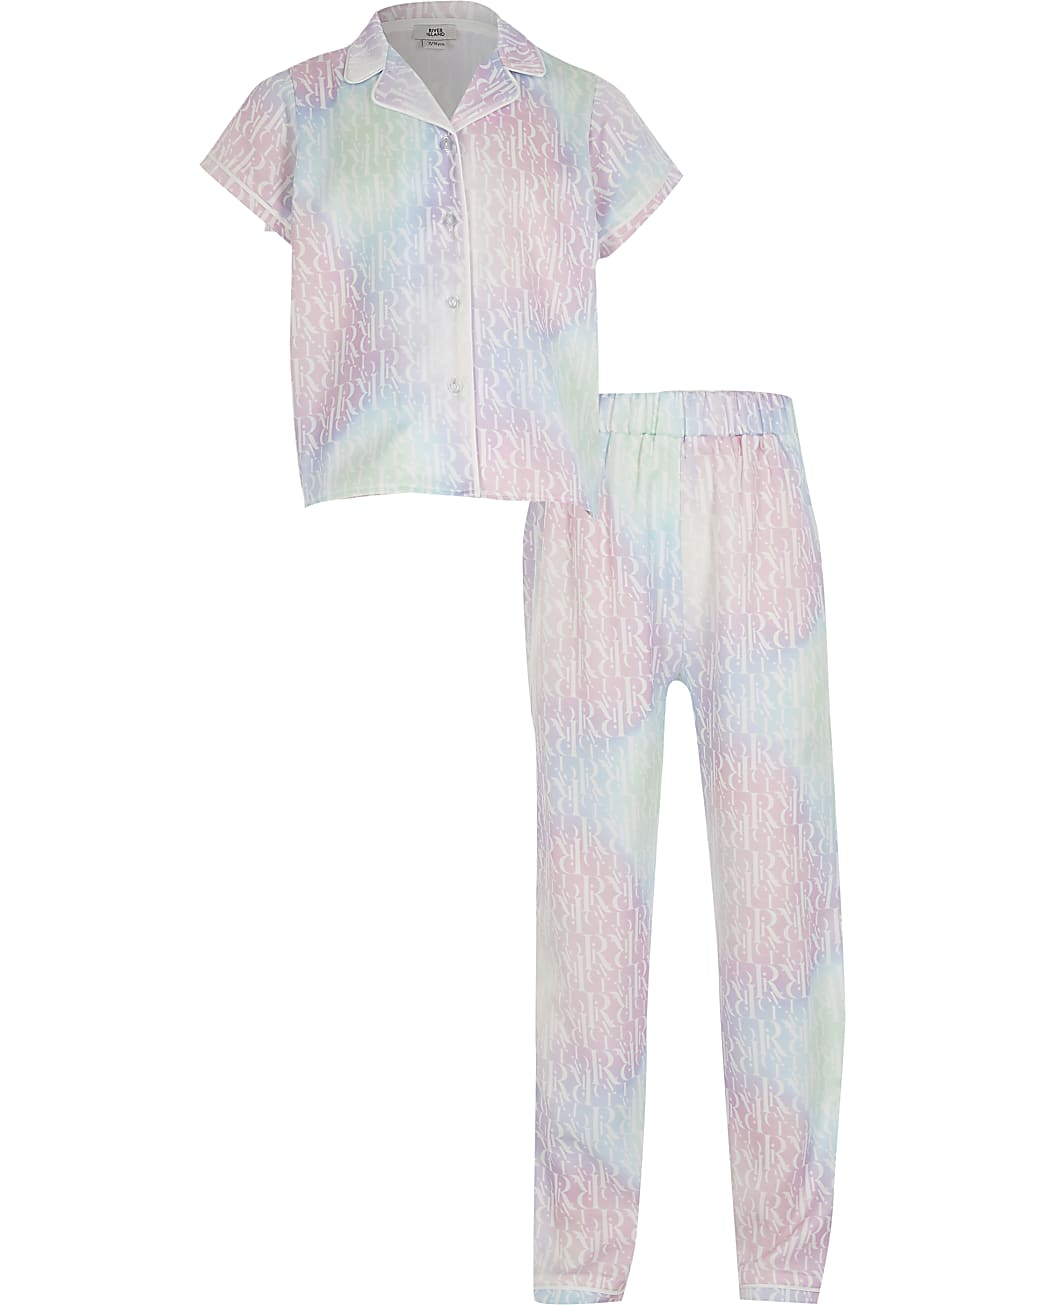 Girls pink tie dye RI monogram pyjamas